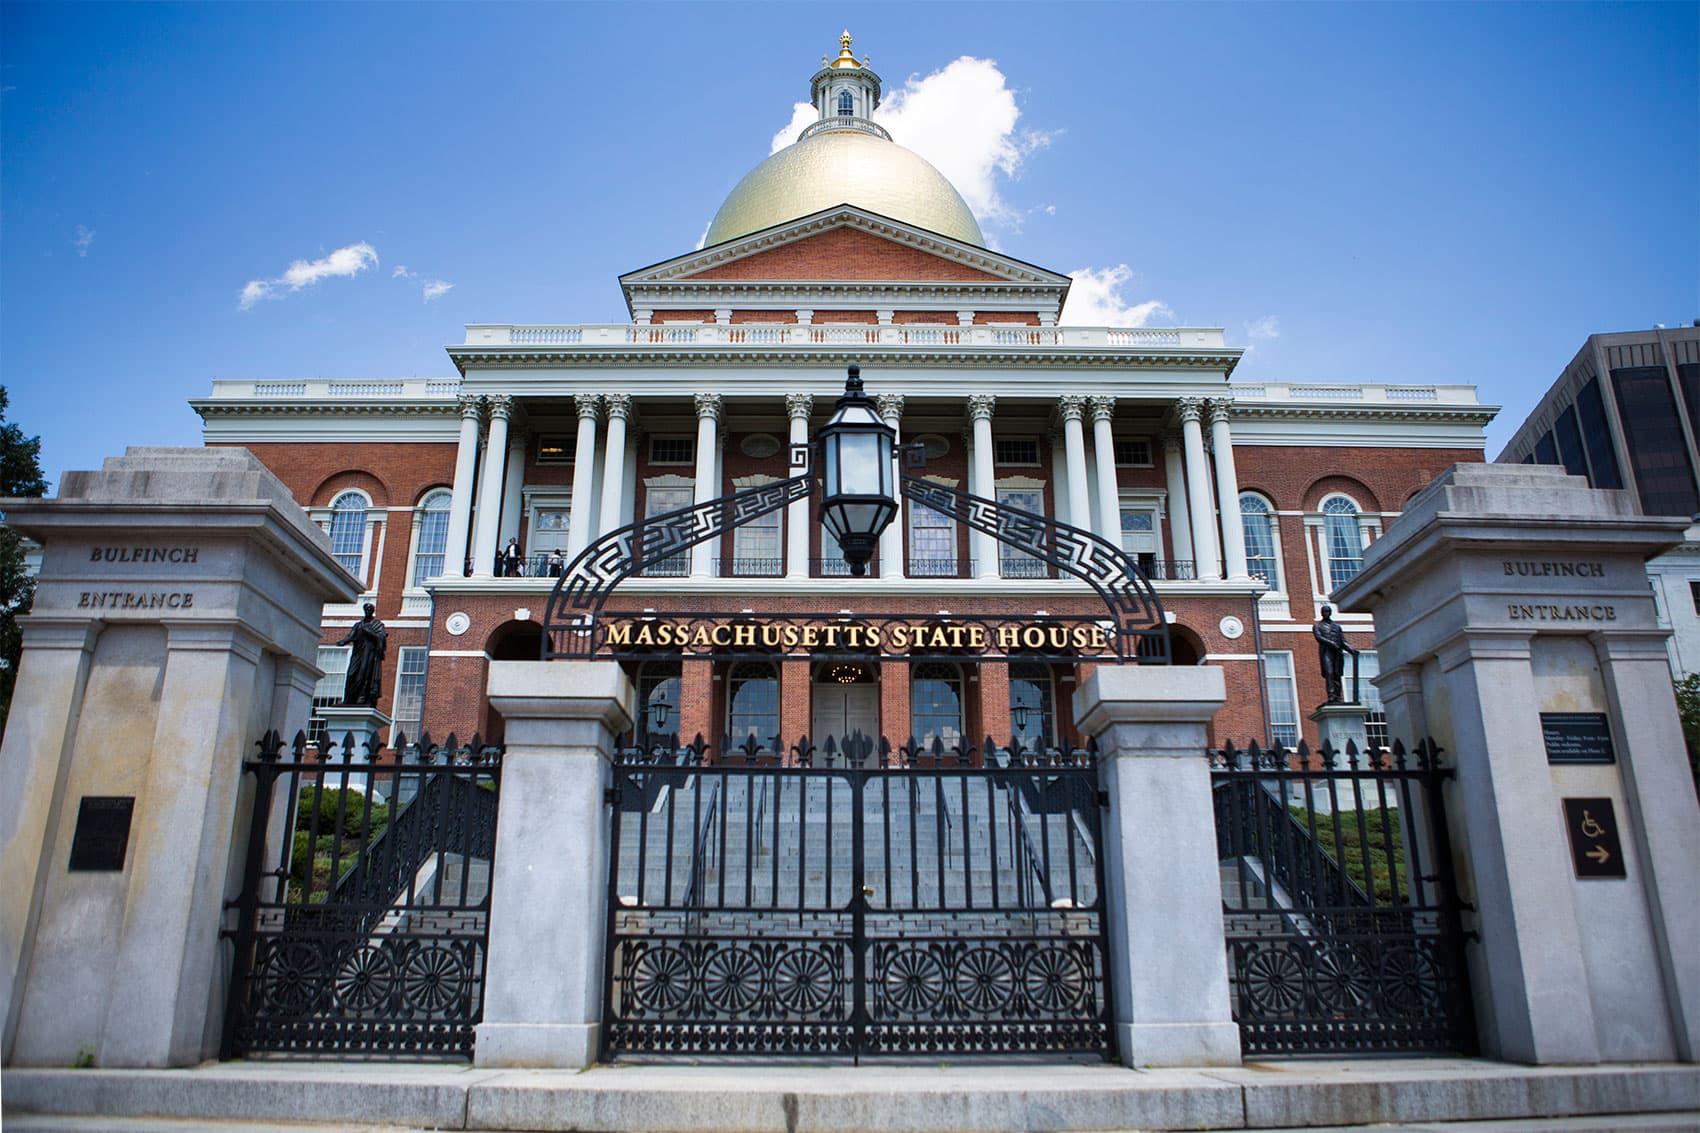 Senate Votes In Favor Of Lawmaker Pay Raises With Veto ...